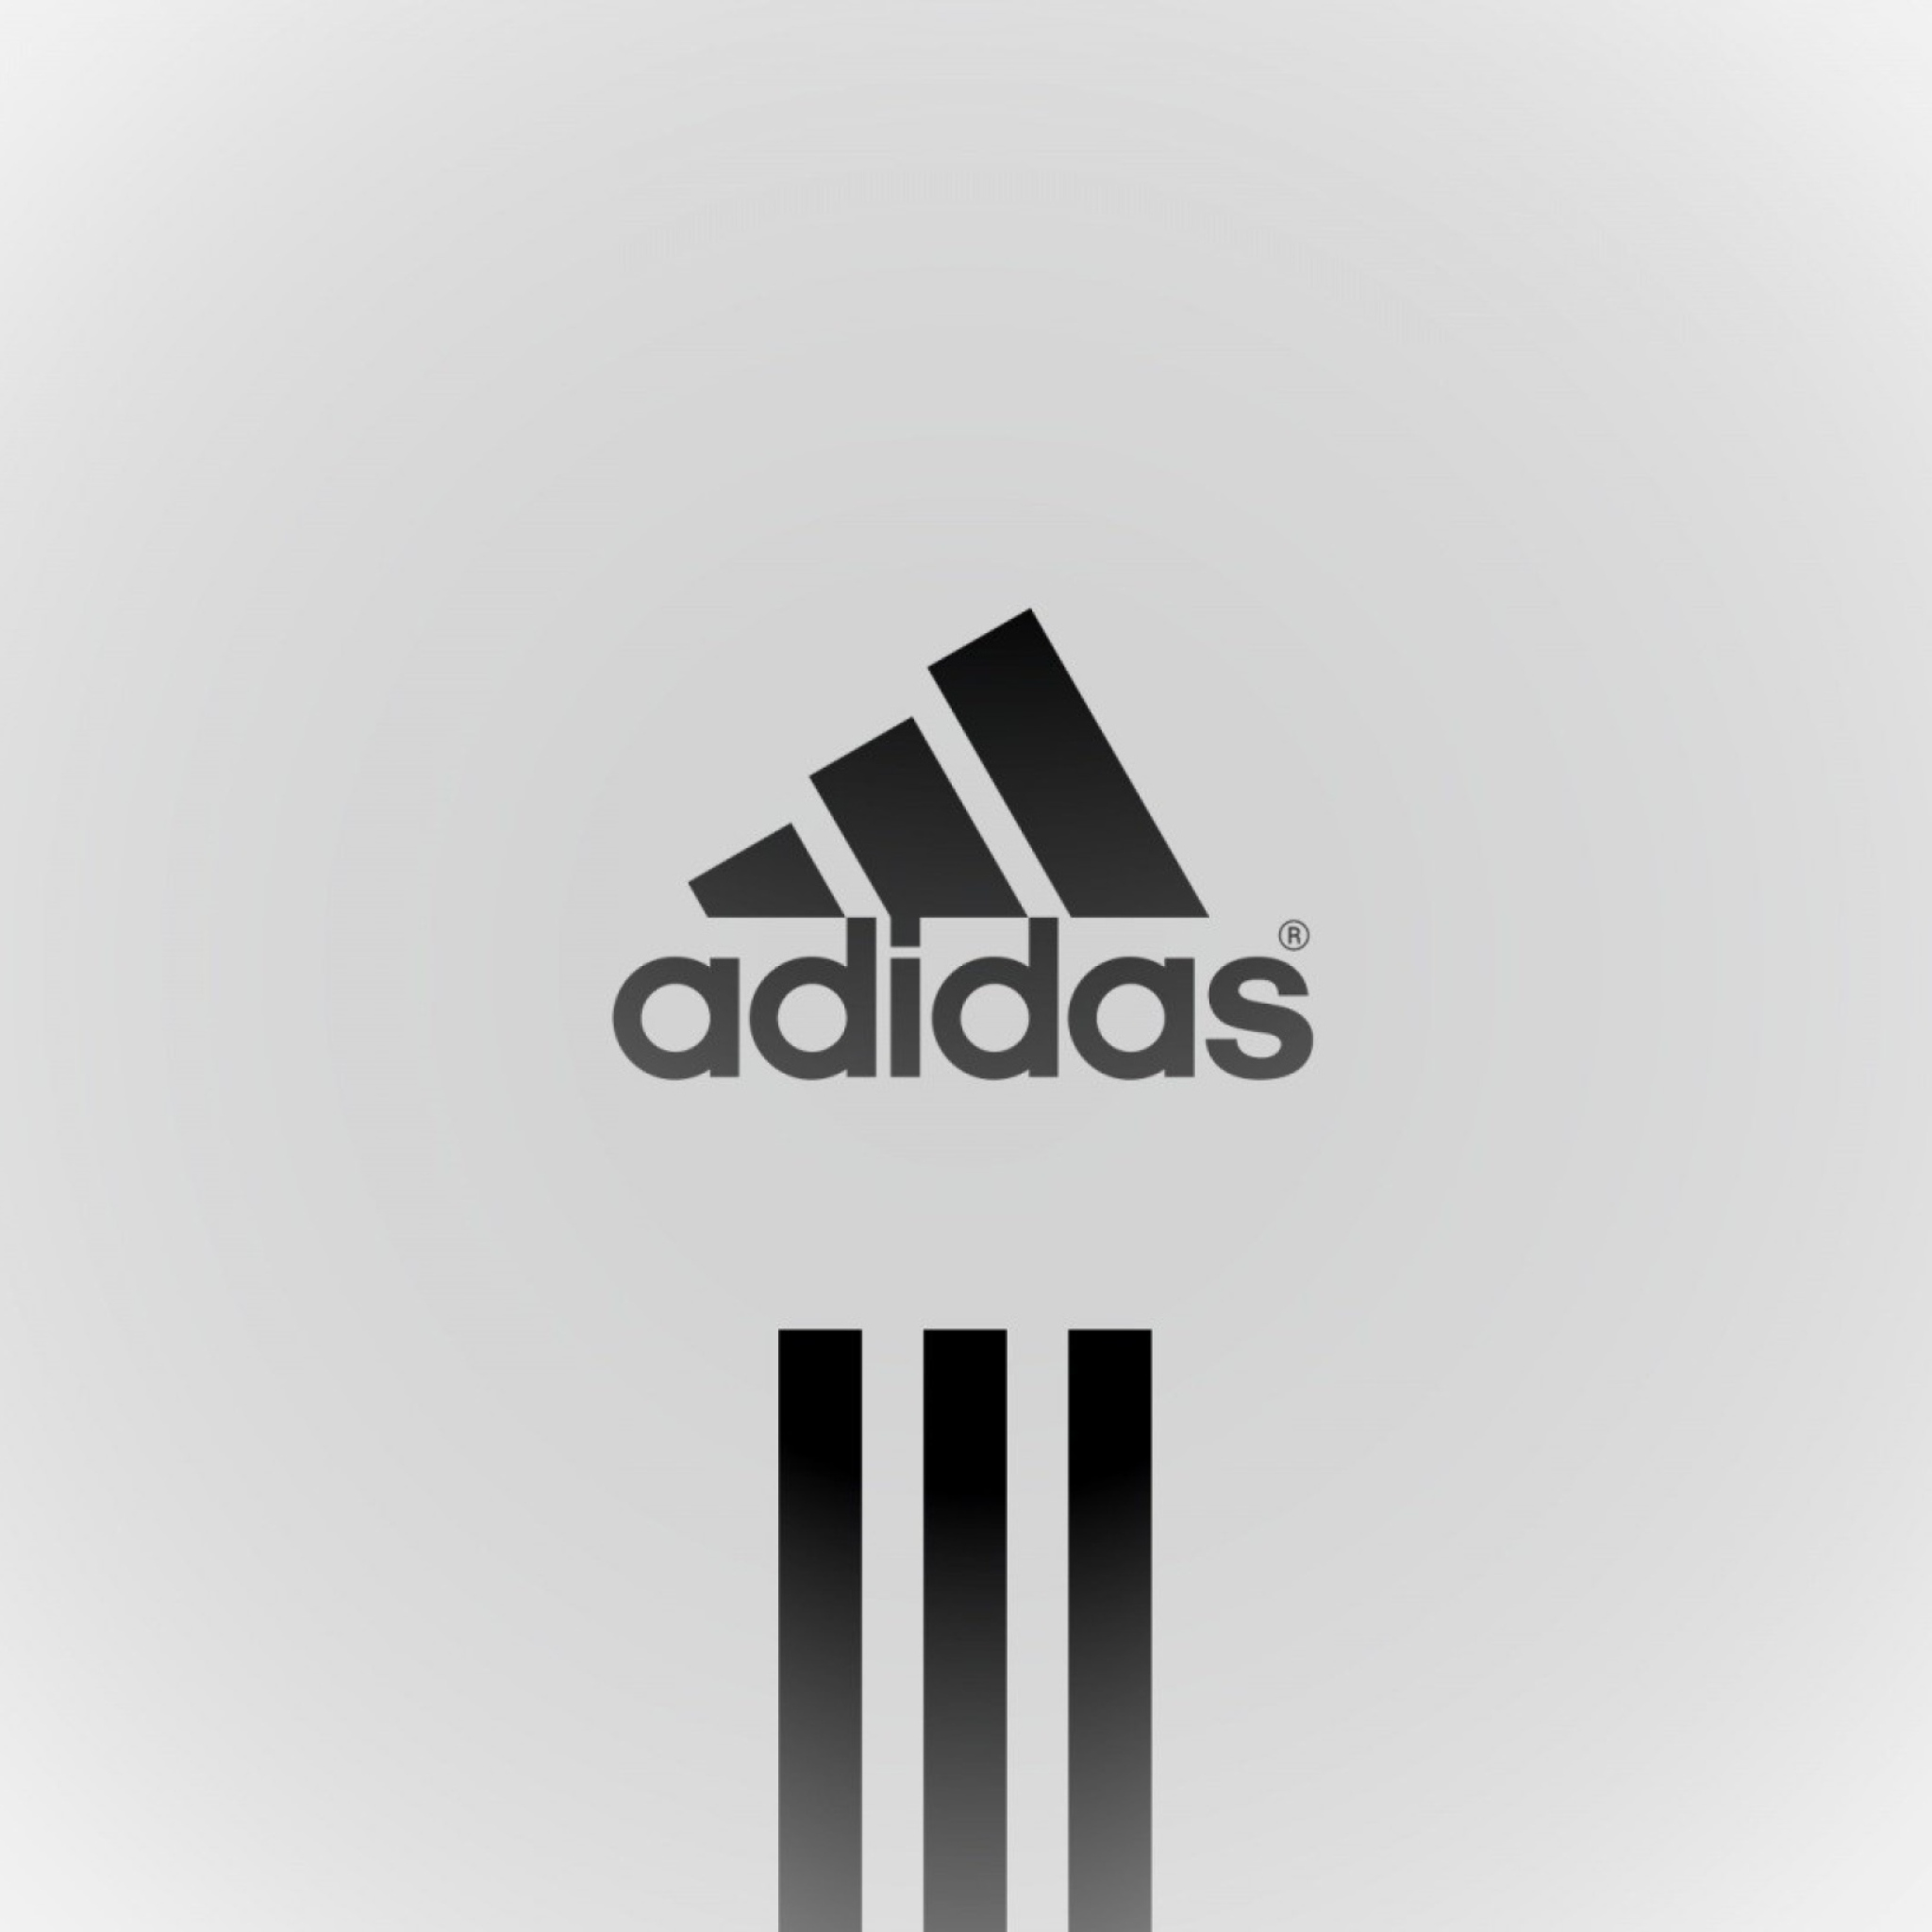 Картинки логотипов адидас